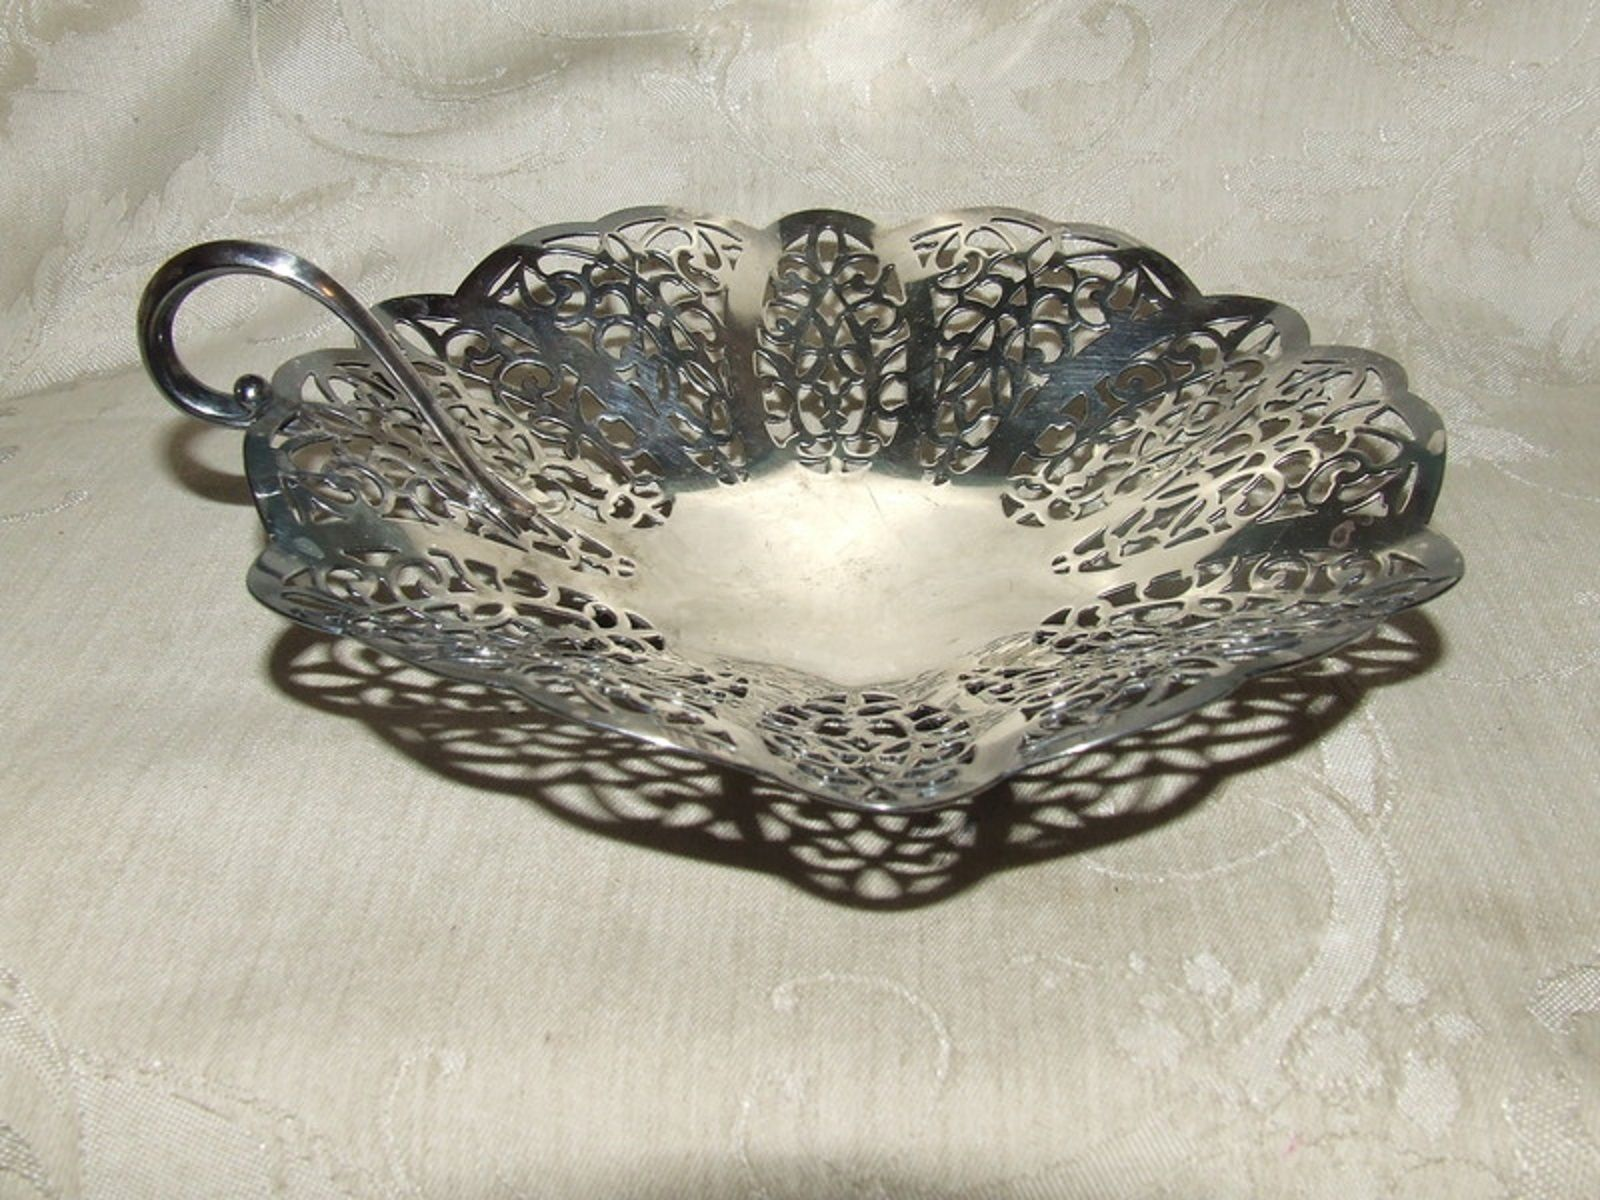 Vintage International Silverplate LOVELACE Pierced 1 Handled Bon Bon Dish #2295 - $16.00